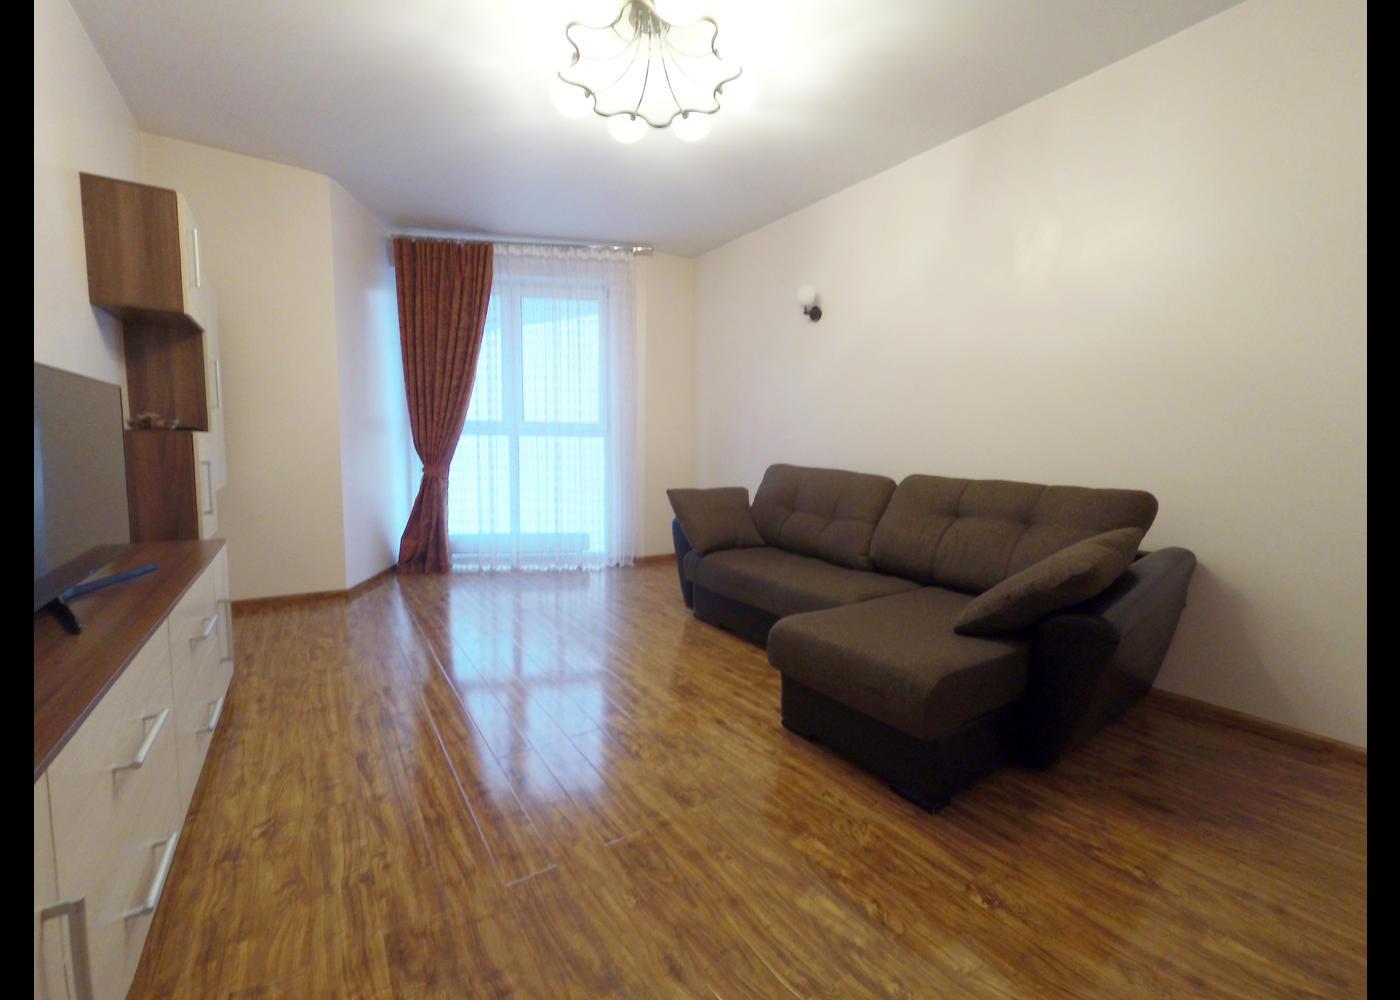 Отделка квартир - Ремонт - Форум • ЖК